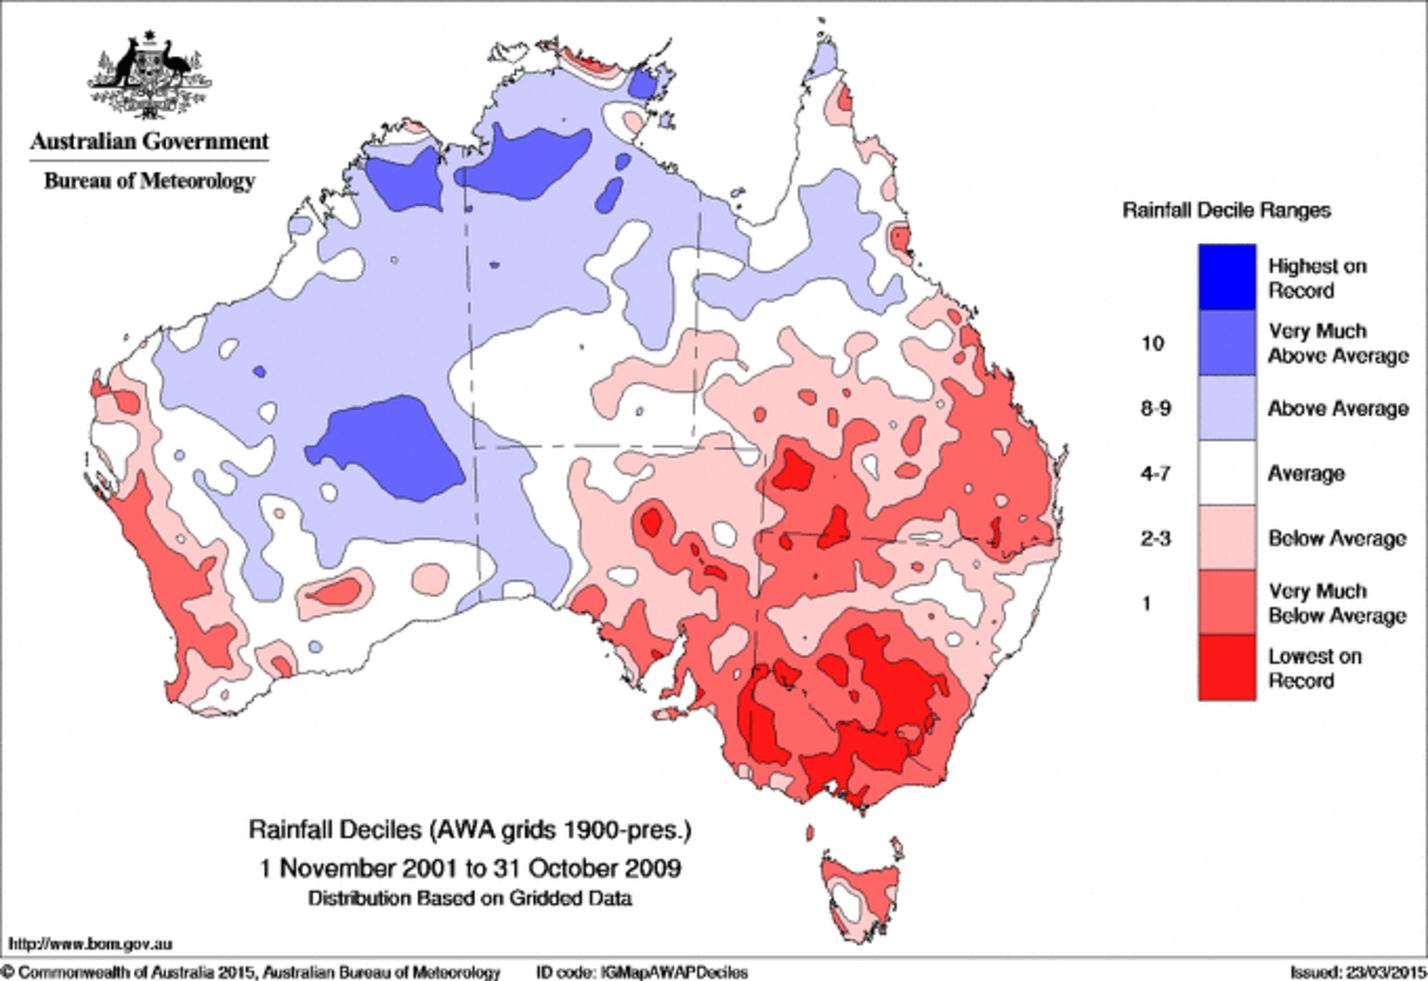 South-east Australia during the peak of the millennium drought (2001-2009) - Image Credit: Australian Bureau of Meteorology